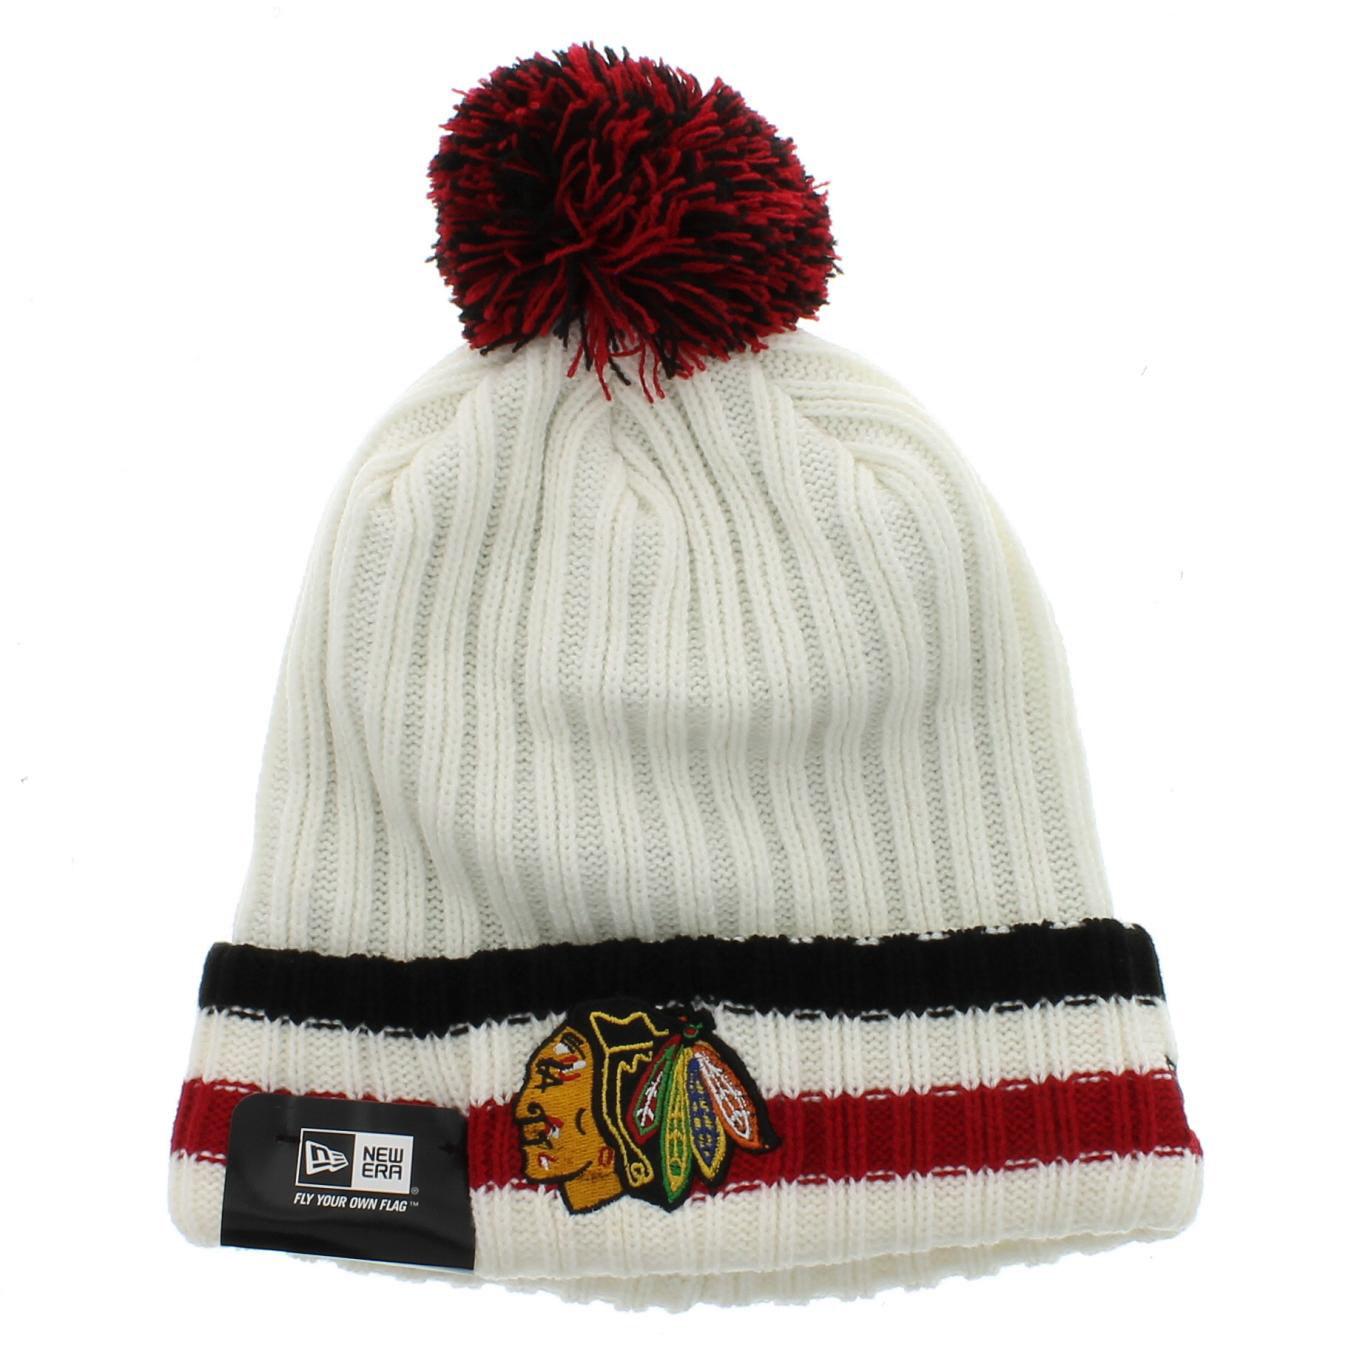 Blackhawks Winter Hats Tag Hats